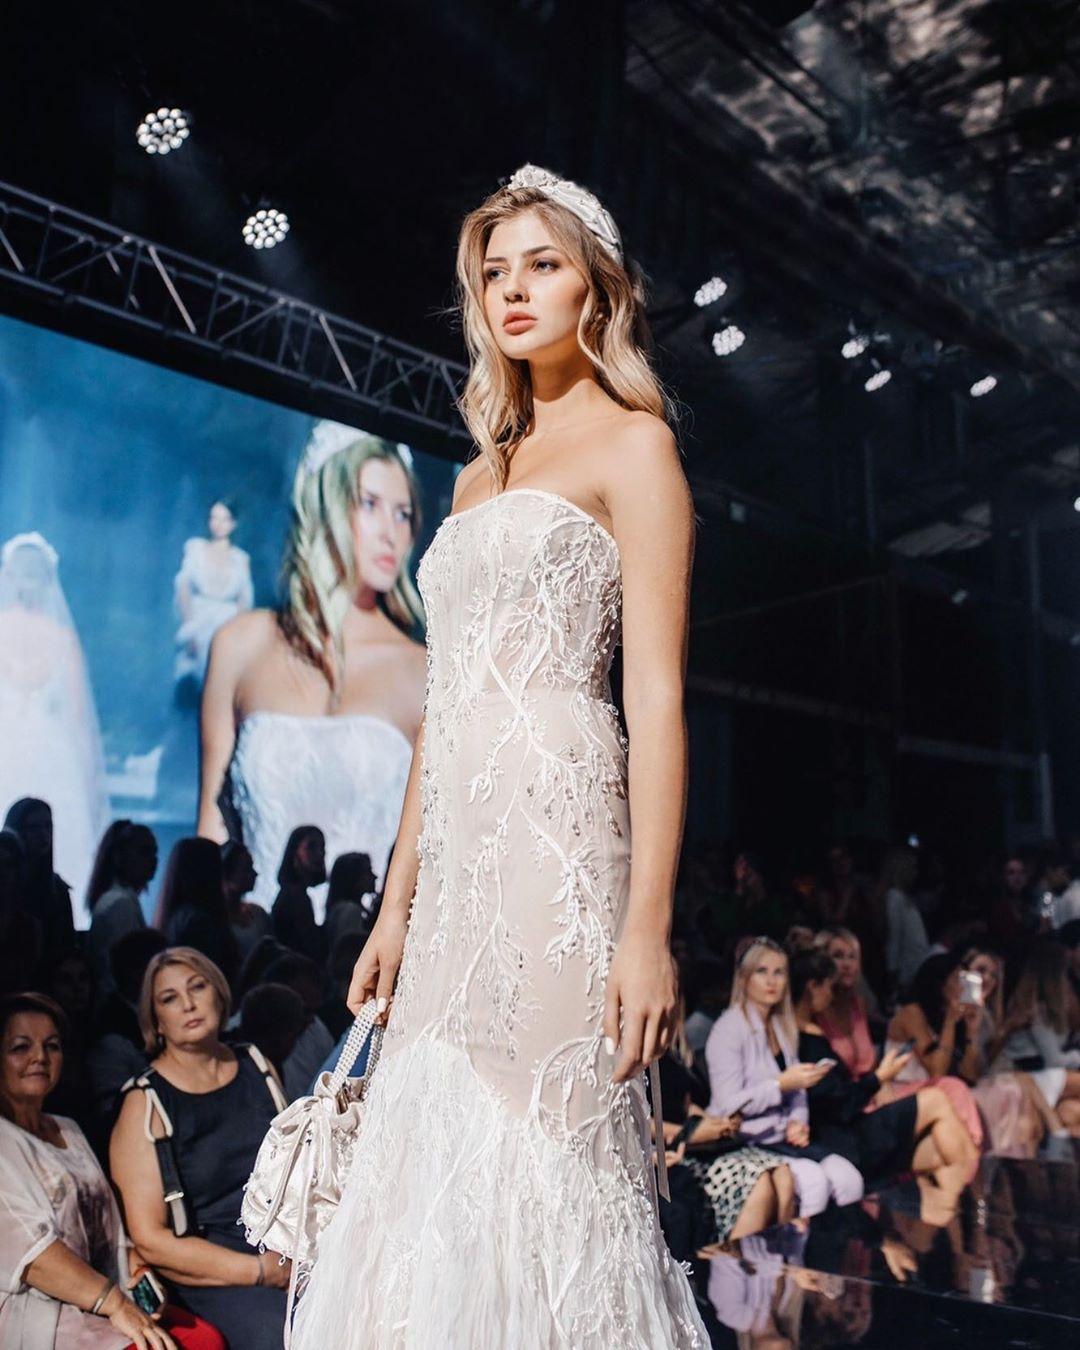 На международном конкурсе красоты Miss International — 2019 от Беларуси поедет бобруйчанка Мария Первий